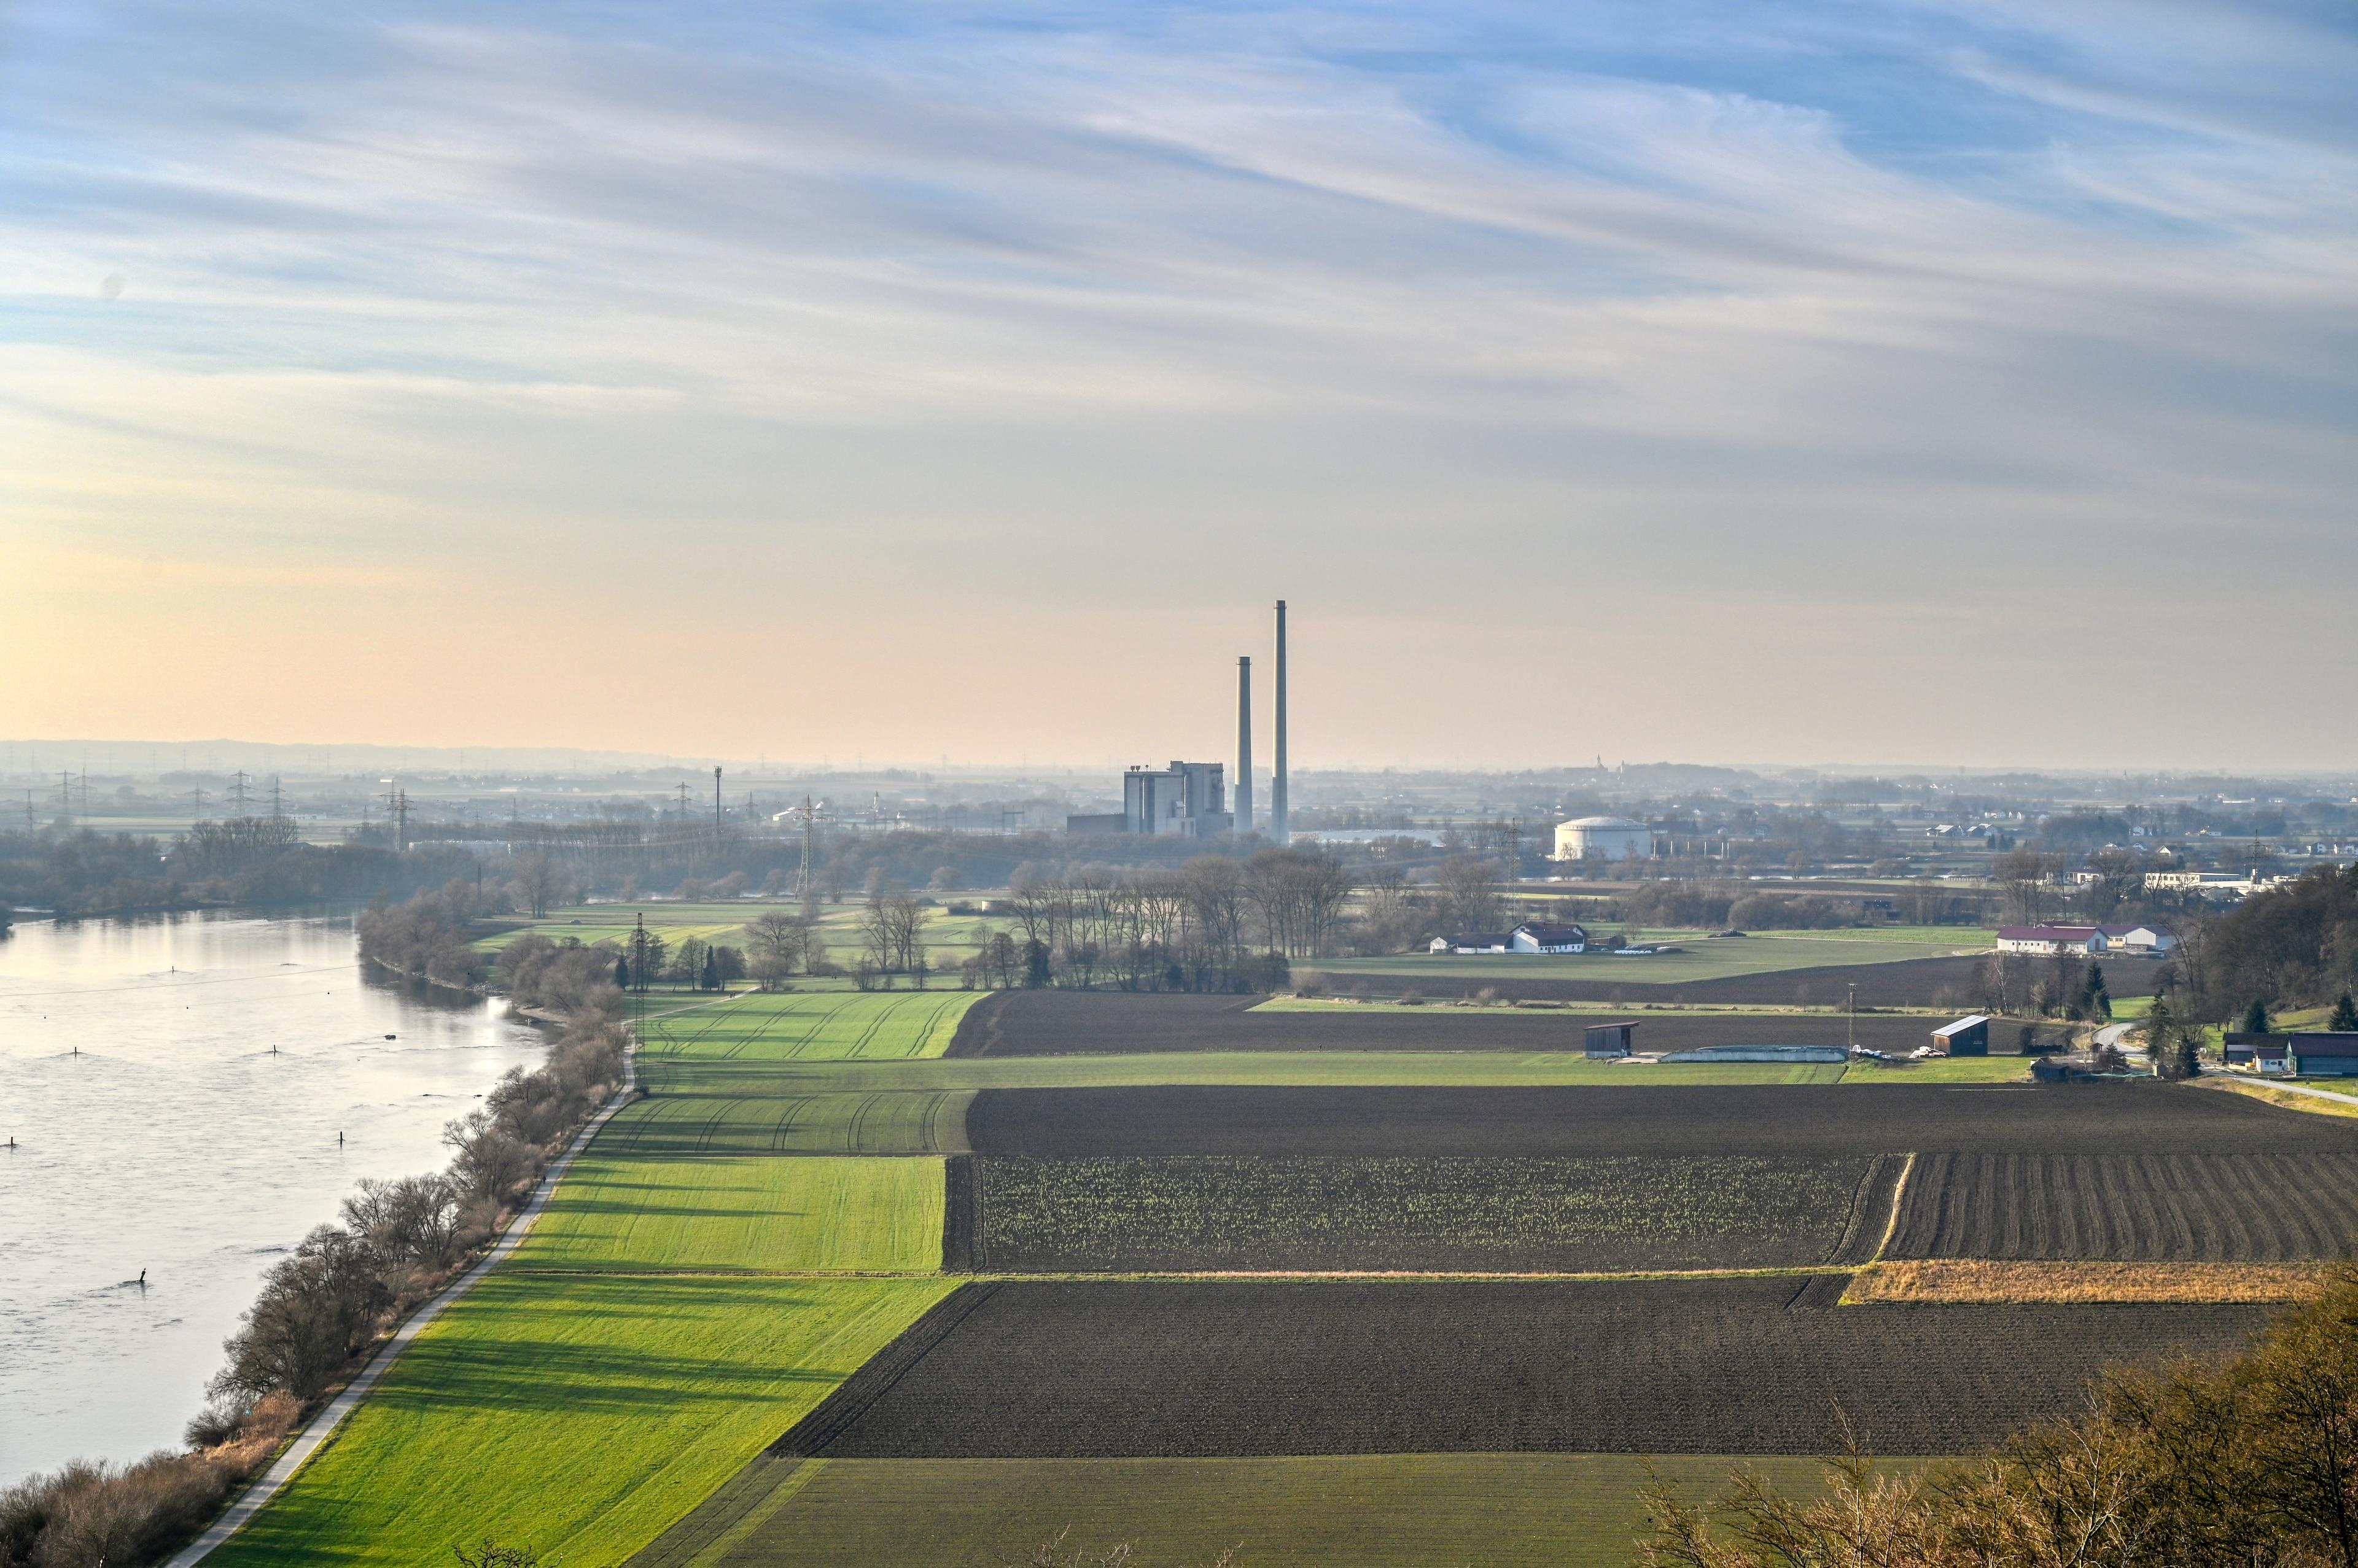 Landkreis Deggendorf District, Bavaria, Germany